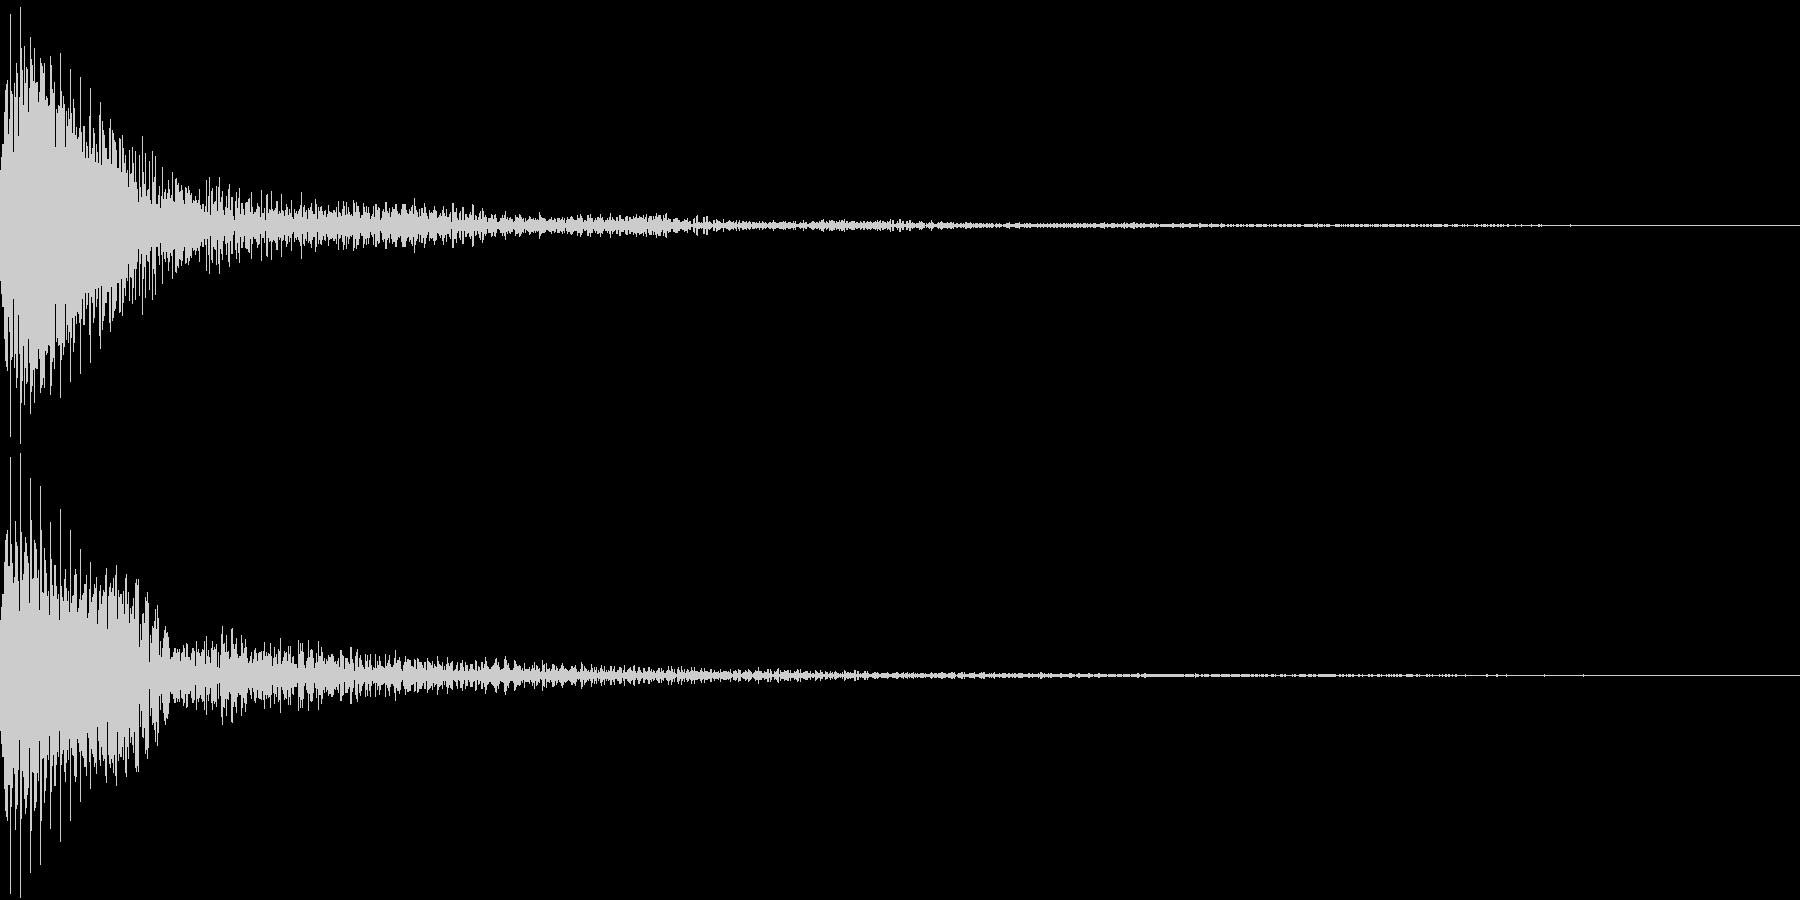 Moog ファットなコマンド音 3の未再生の波形